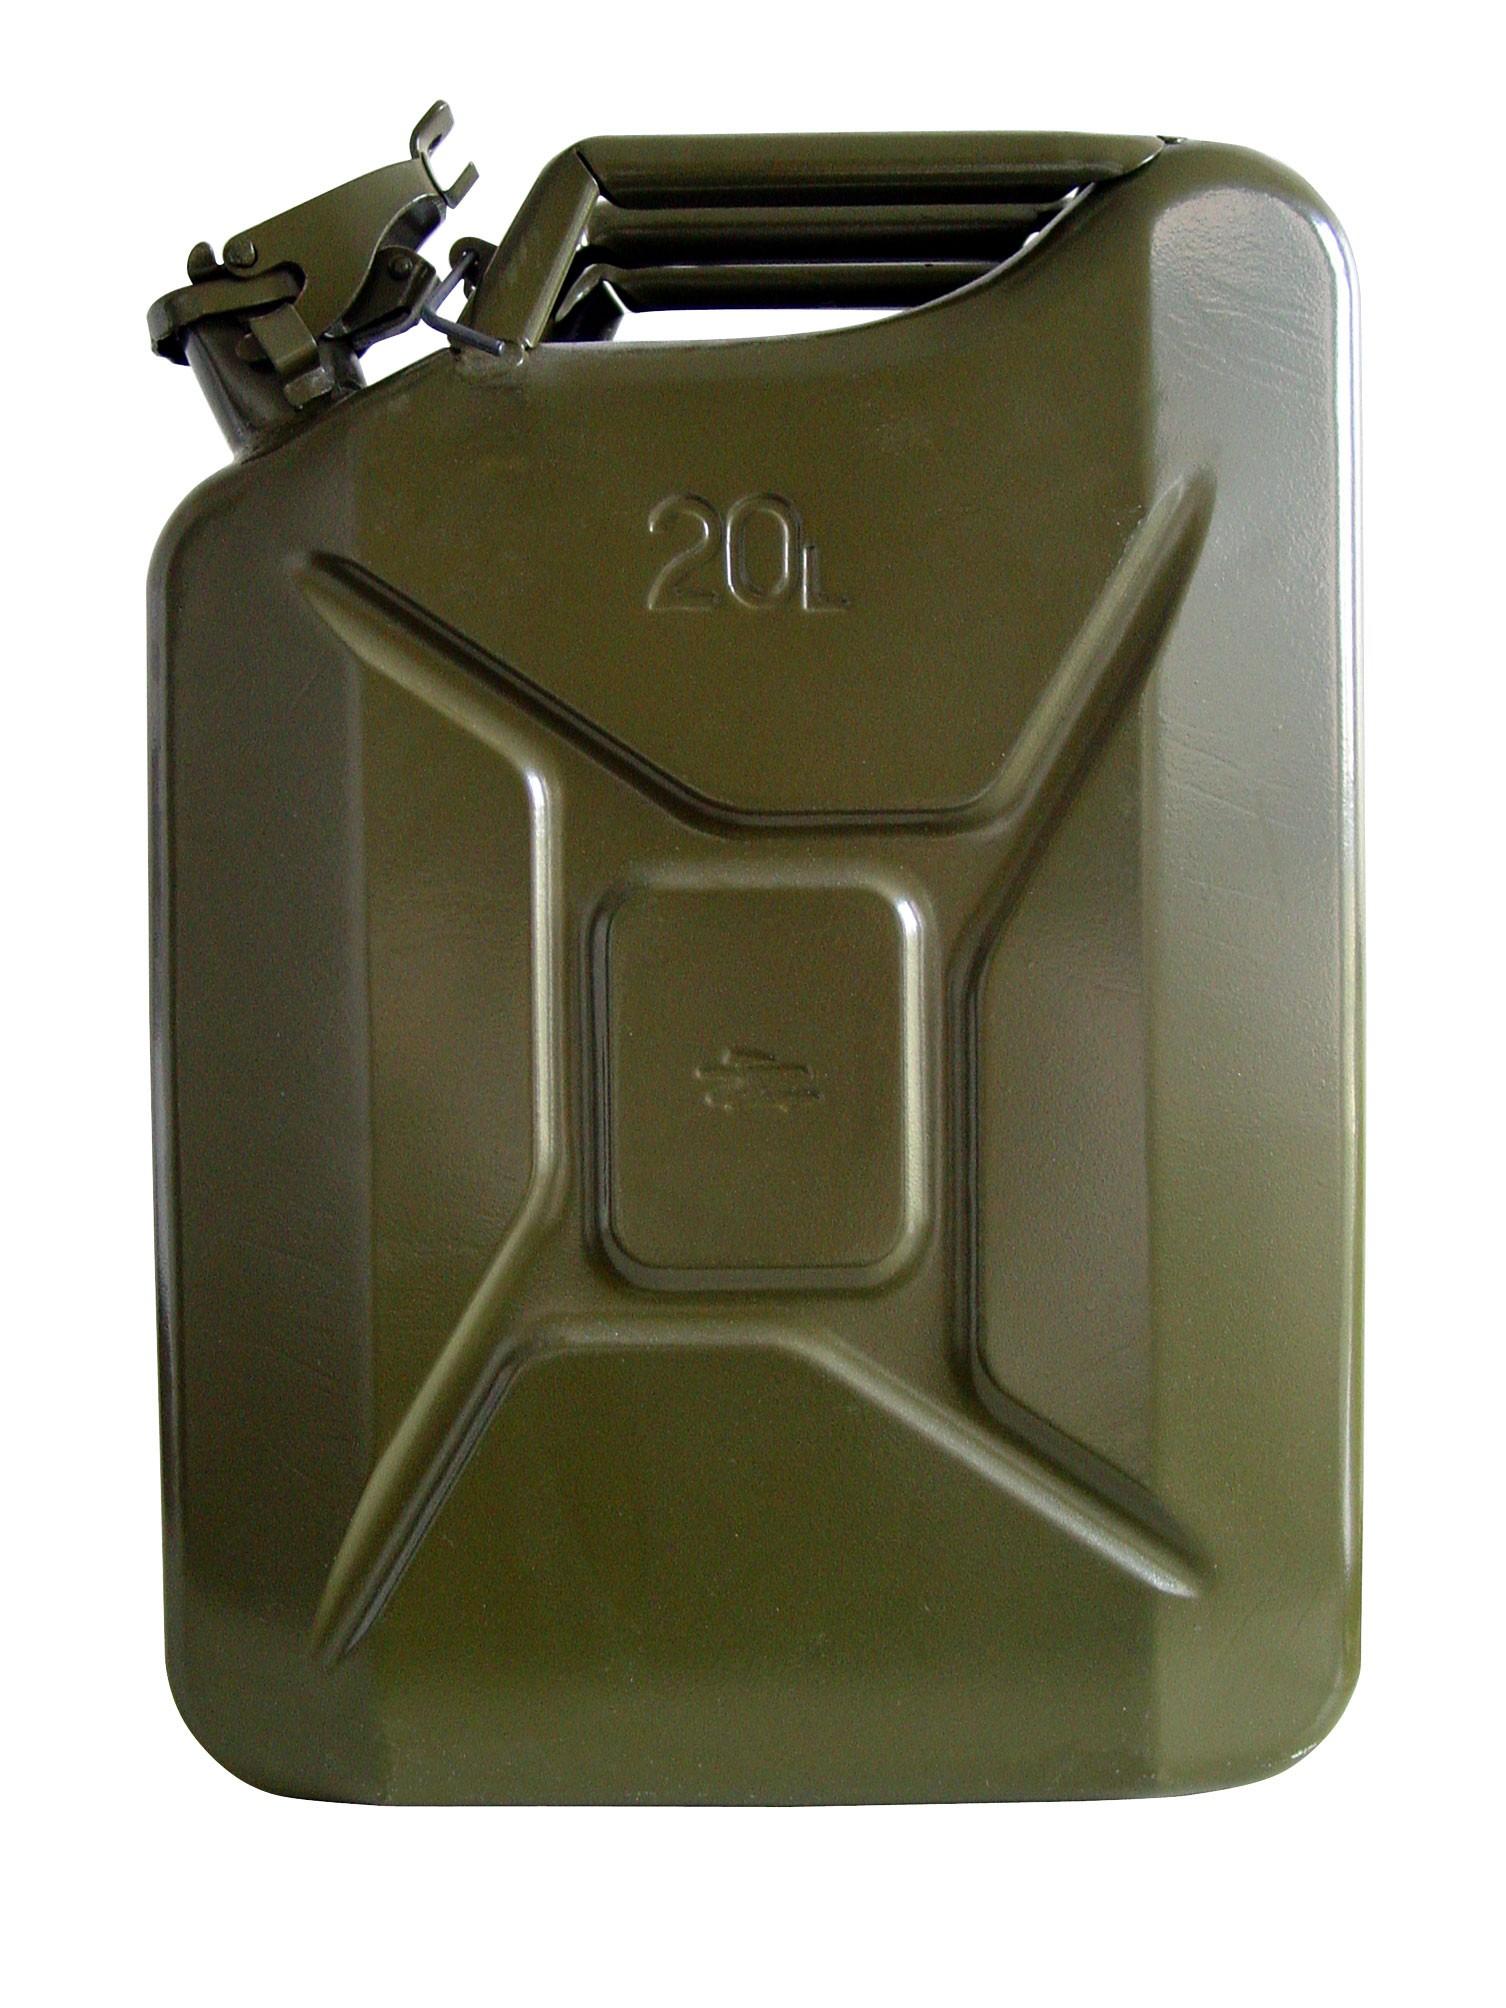 Unitec Benzinkanister / Stahlblechkanister 20 Liter Bild 1